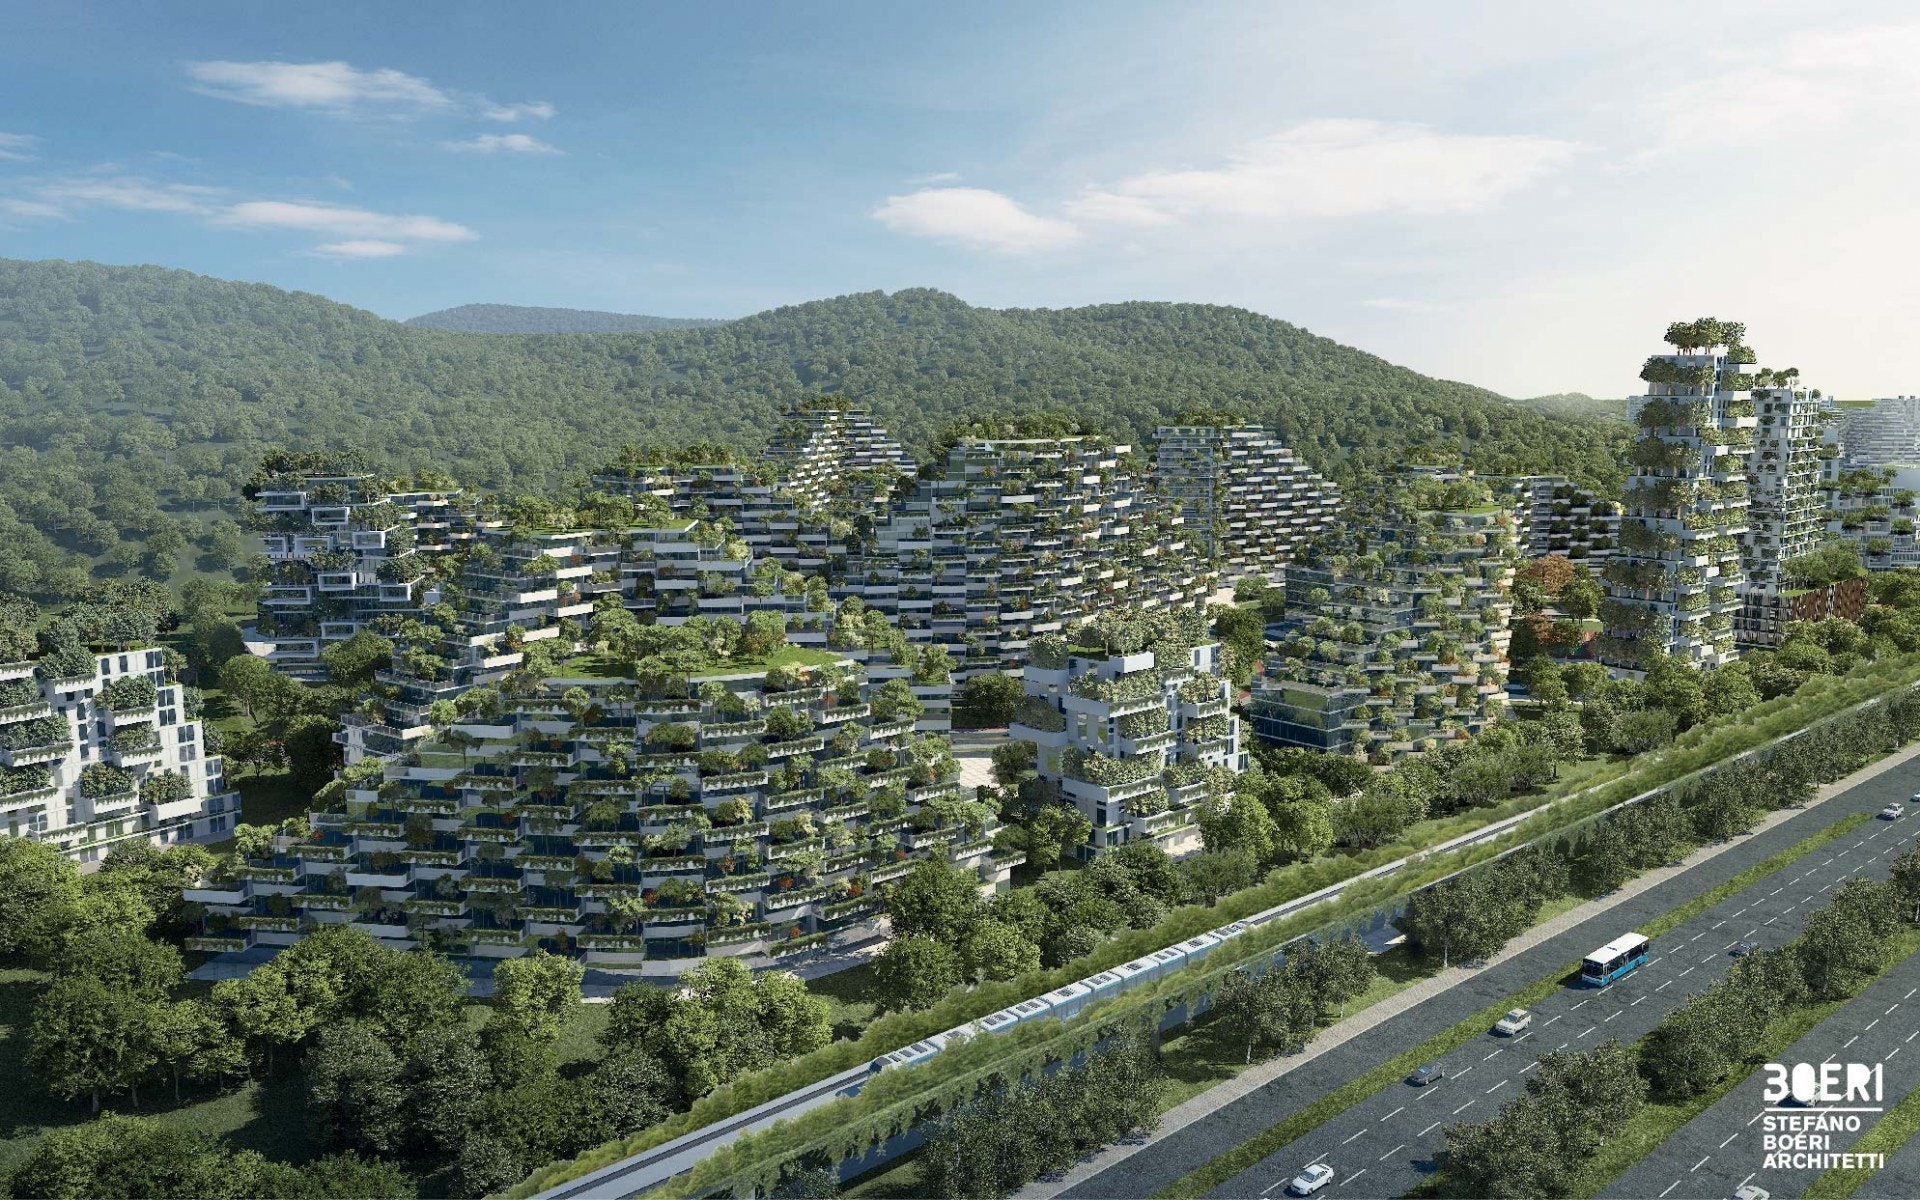 stefano boeri architetti liuzhou forest city tree apartment building architecture